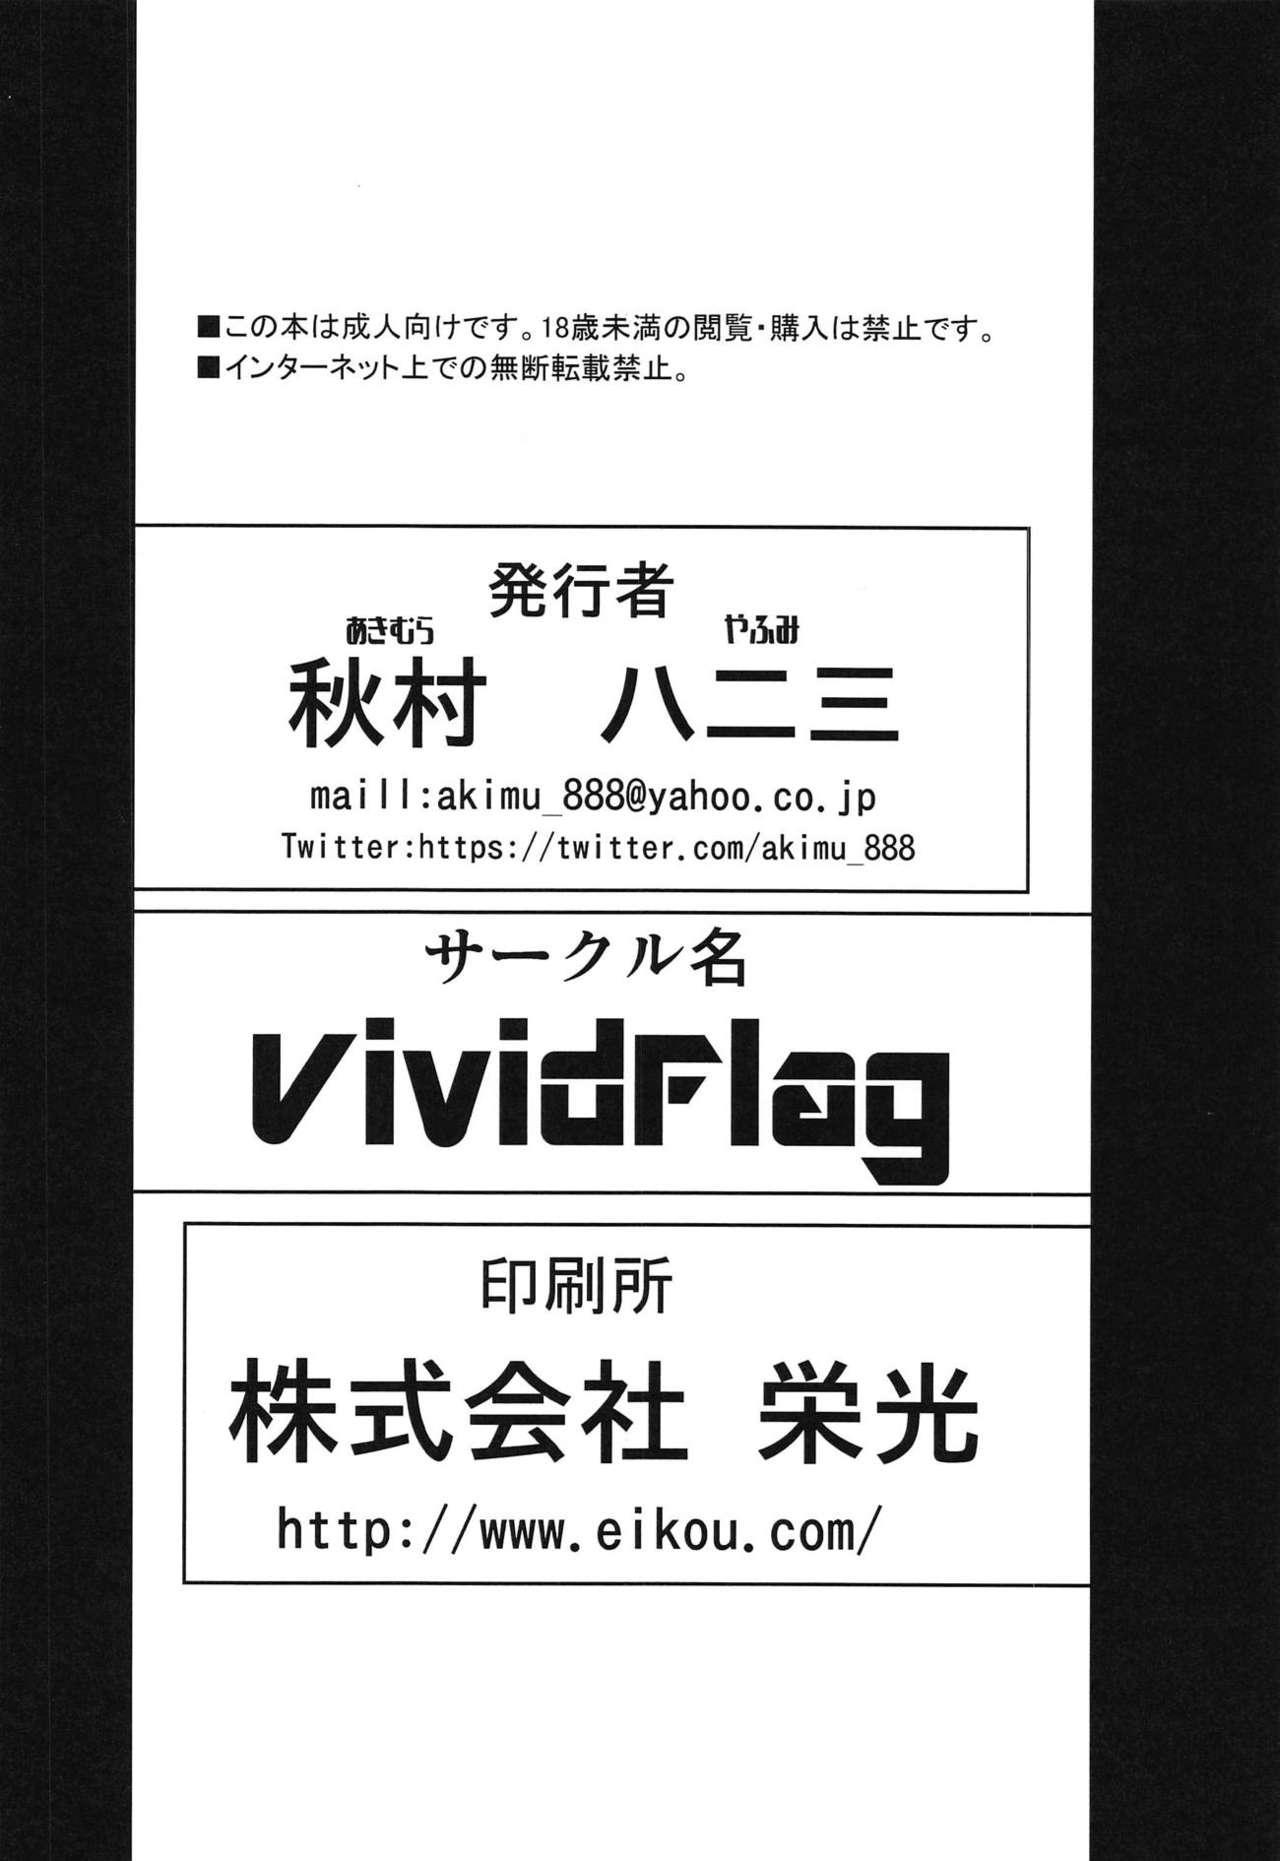 Osaki Shimai no Seiteki Link Appeal 16